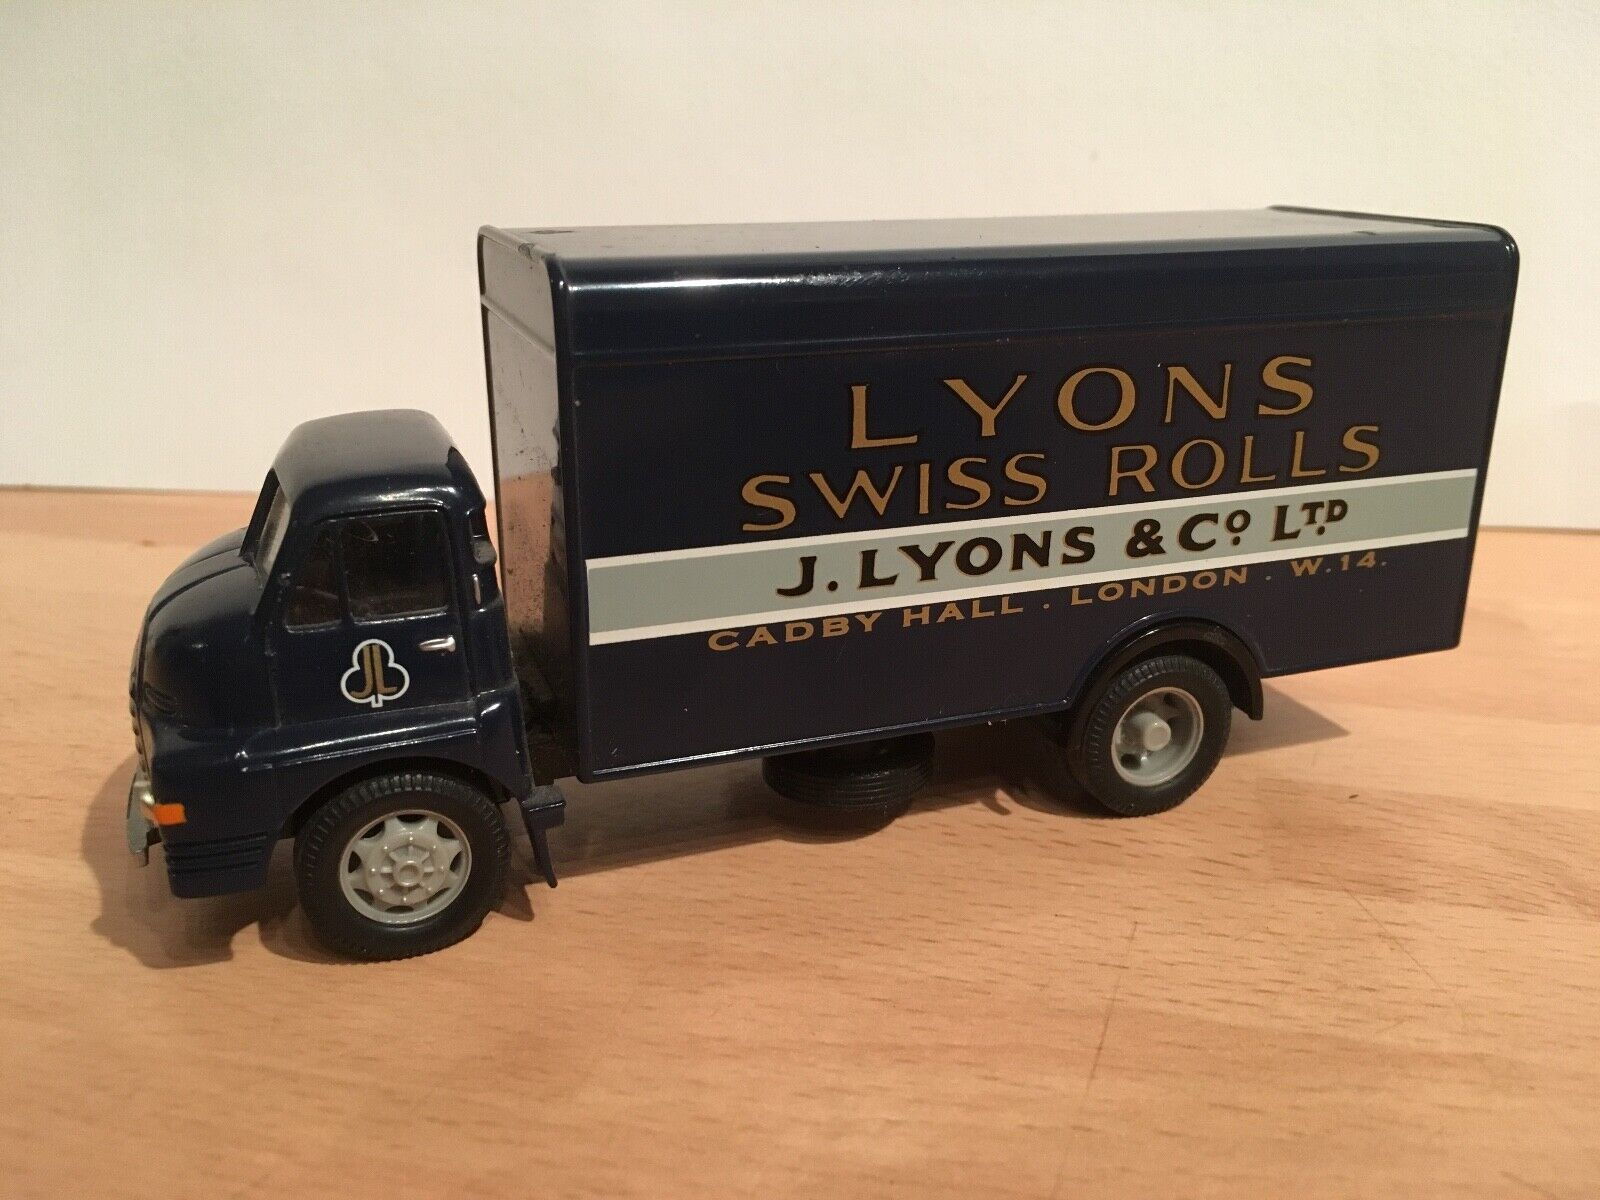 CORGI 1 50 50 50 SCALE BEDFORD S LORRY   LYONS Swiss rolls DELIVERY VAN DIECAST MODEL b6deee